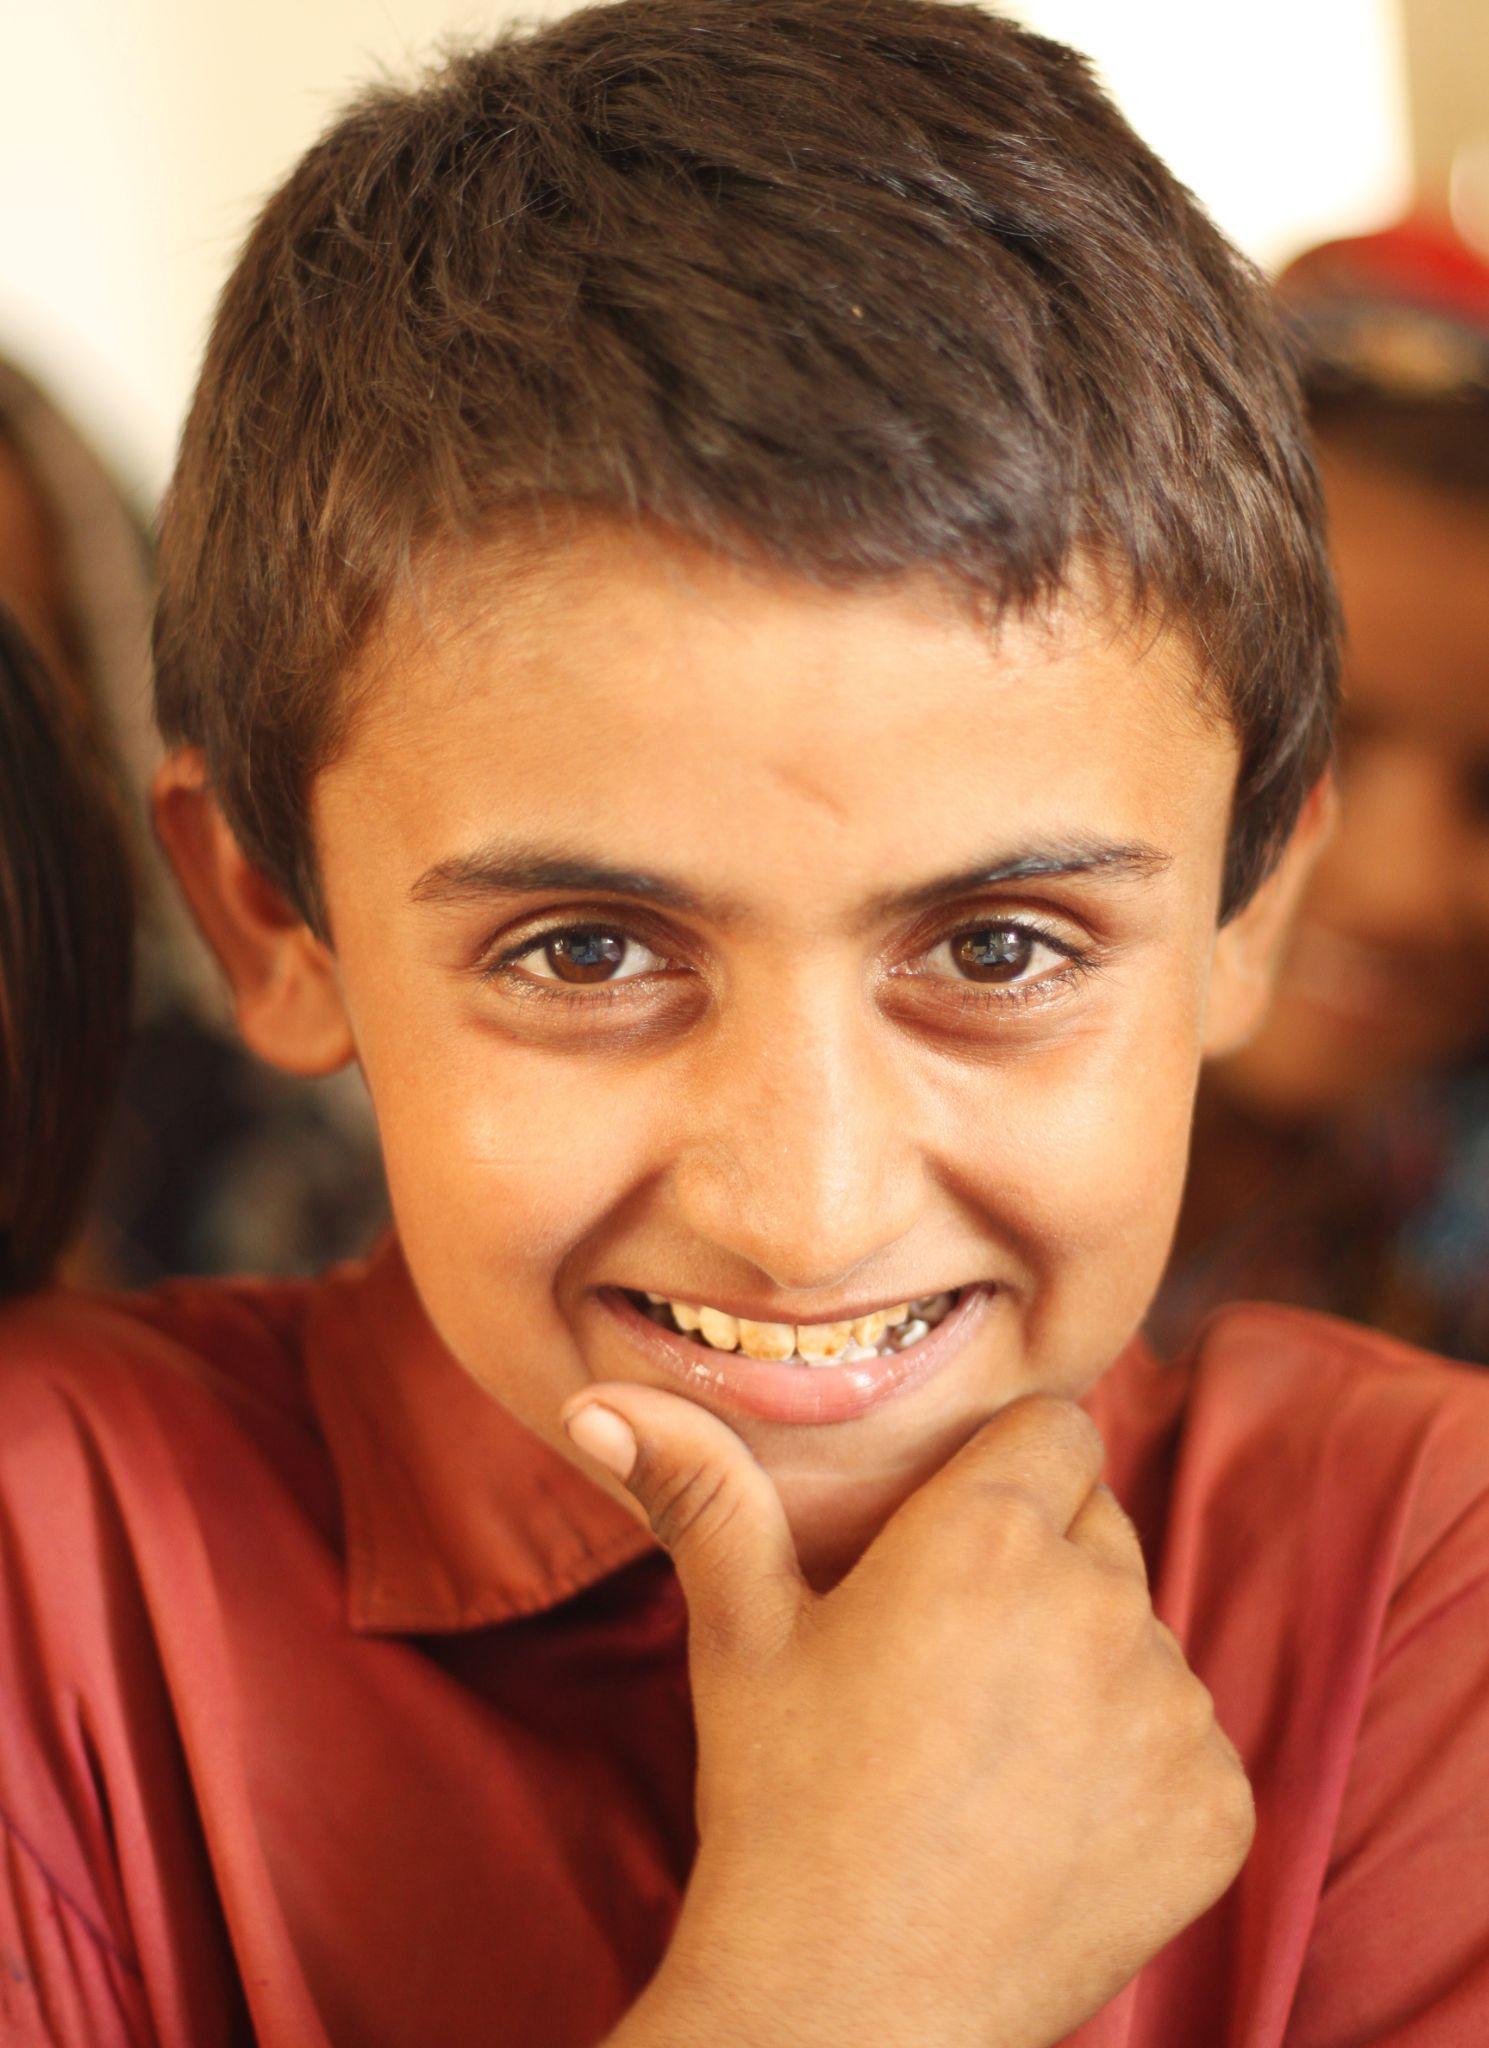 Smiling boy by Manoj Kumar Genani